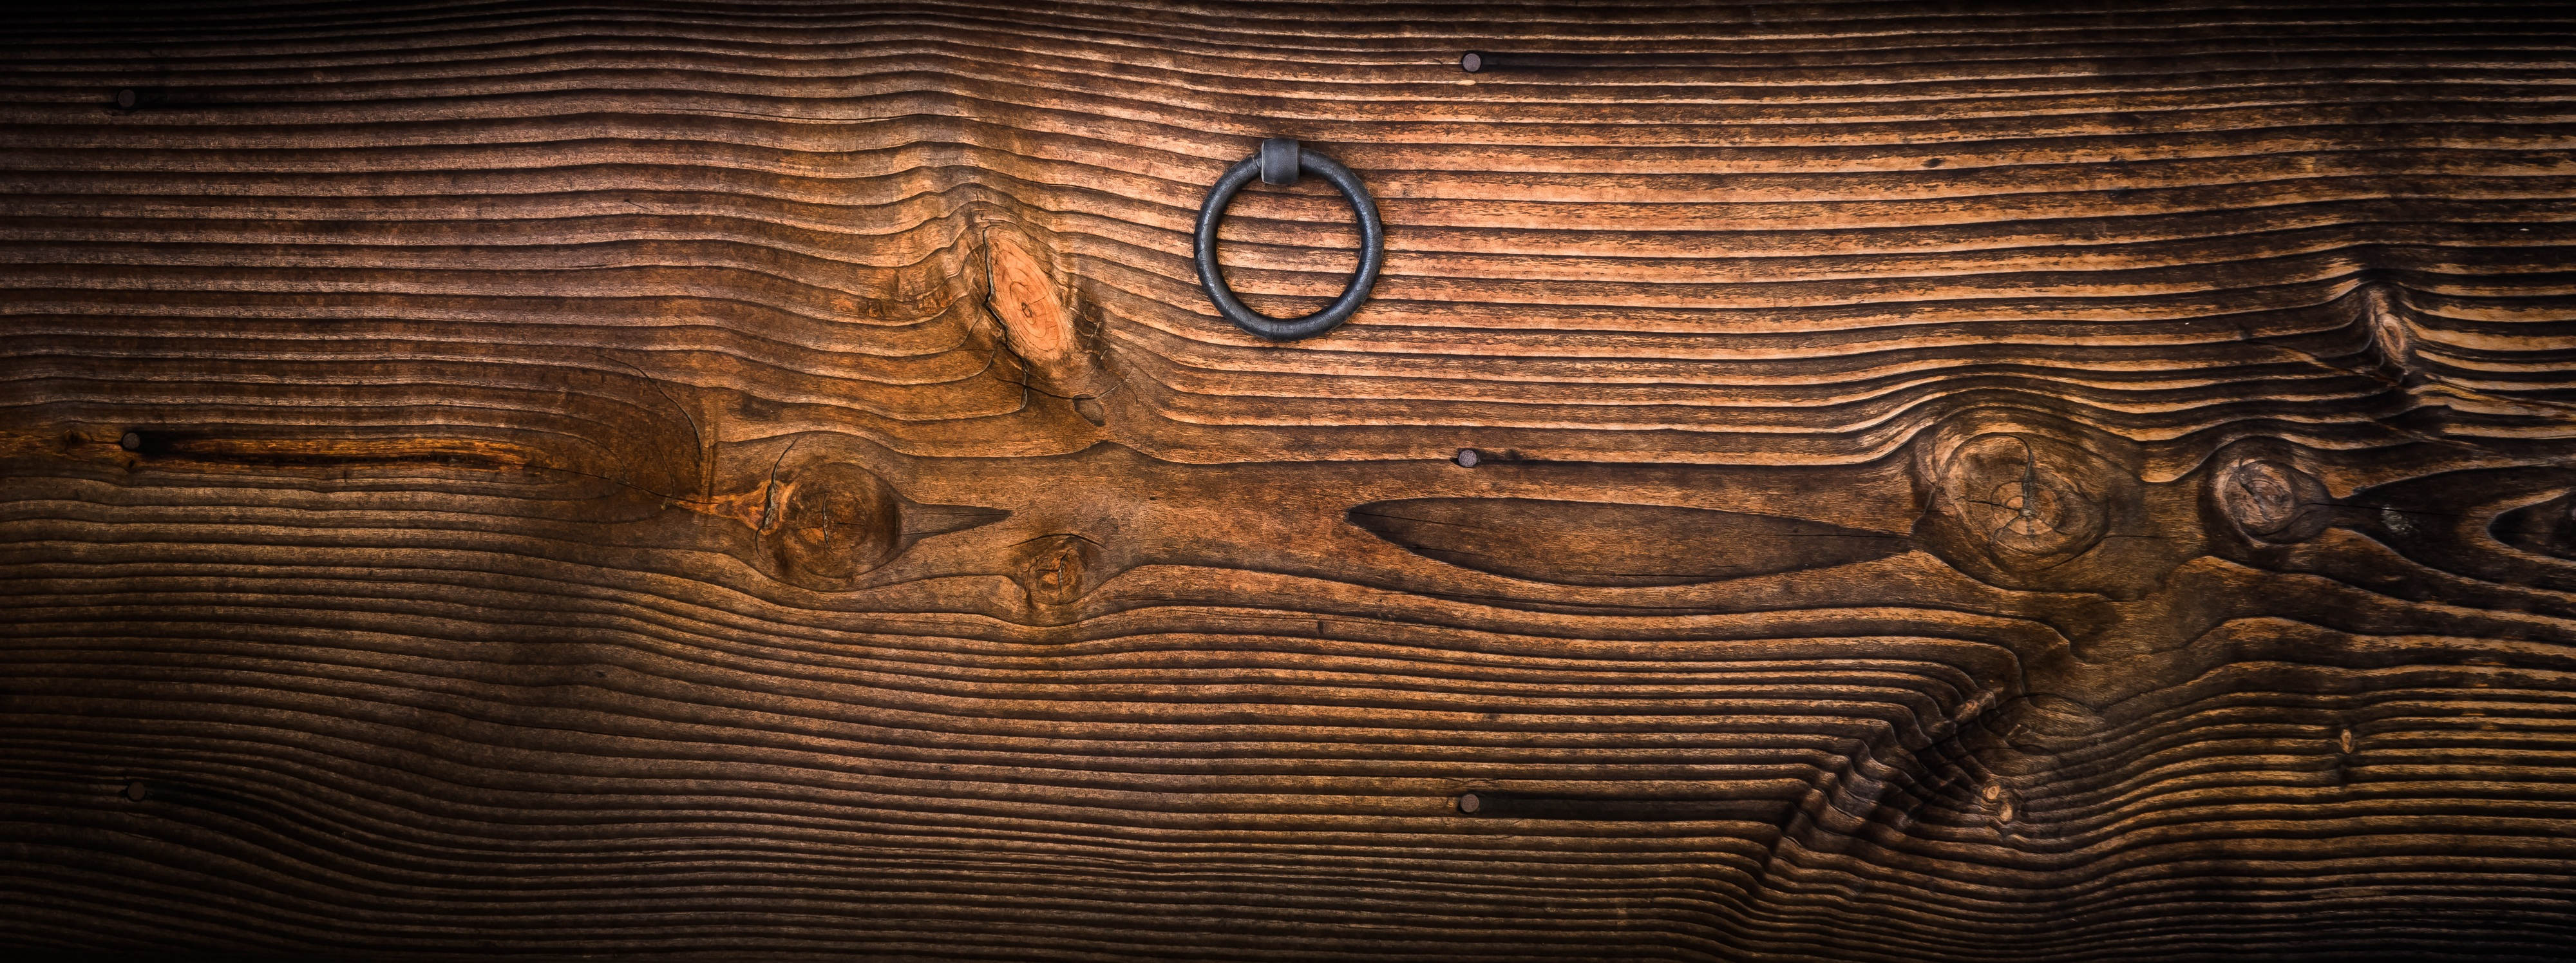 Celtic Wallpaper Hd Gray Metal Door Knocker On Wooden Panel 183 Free Stock Photo